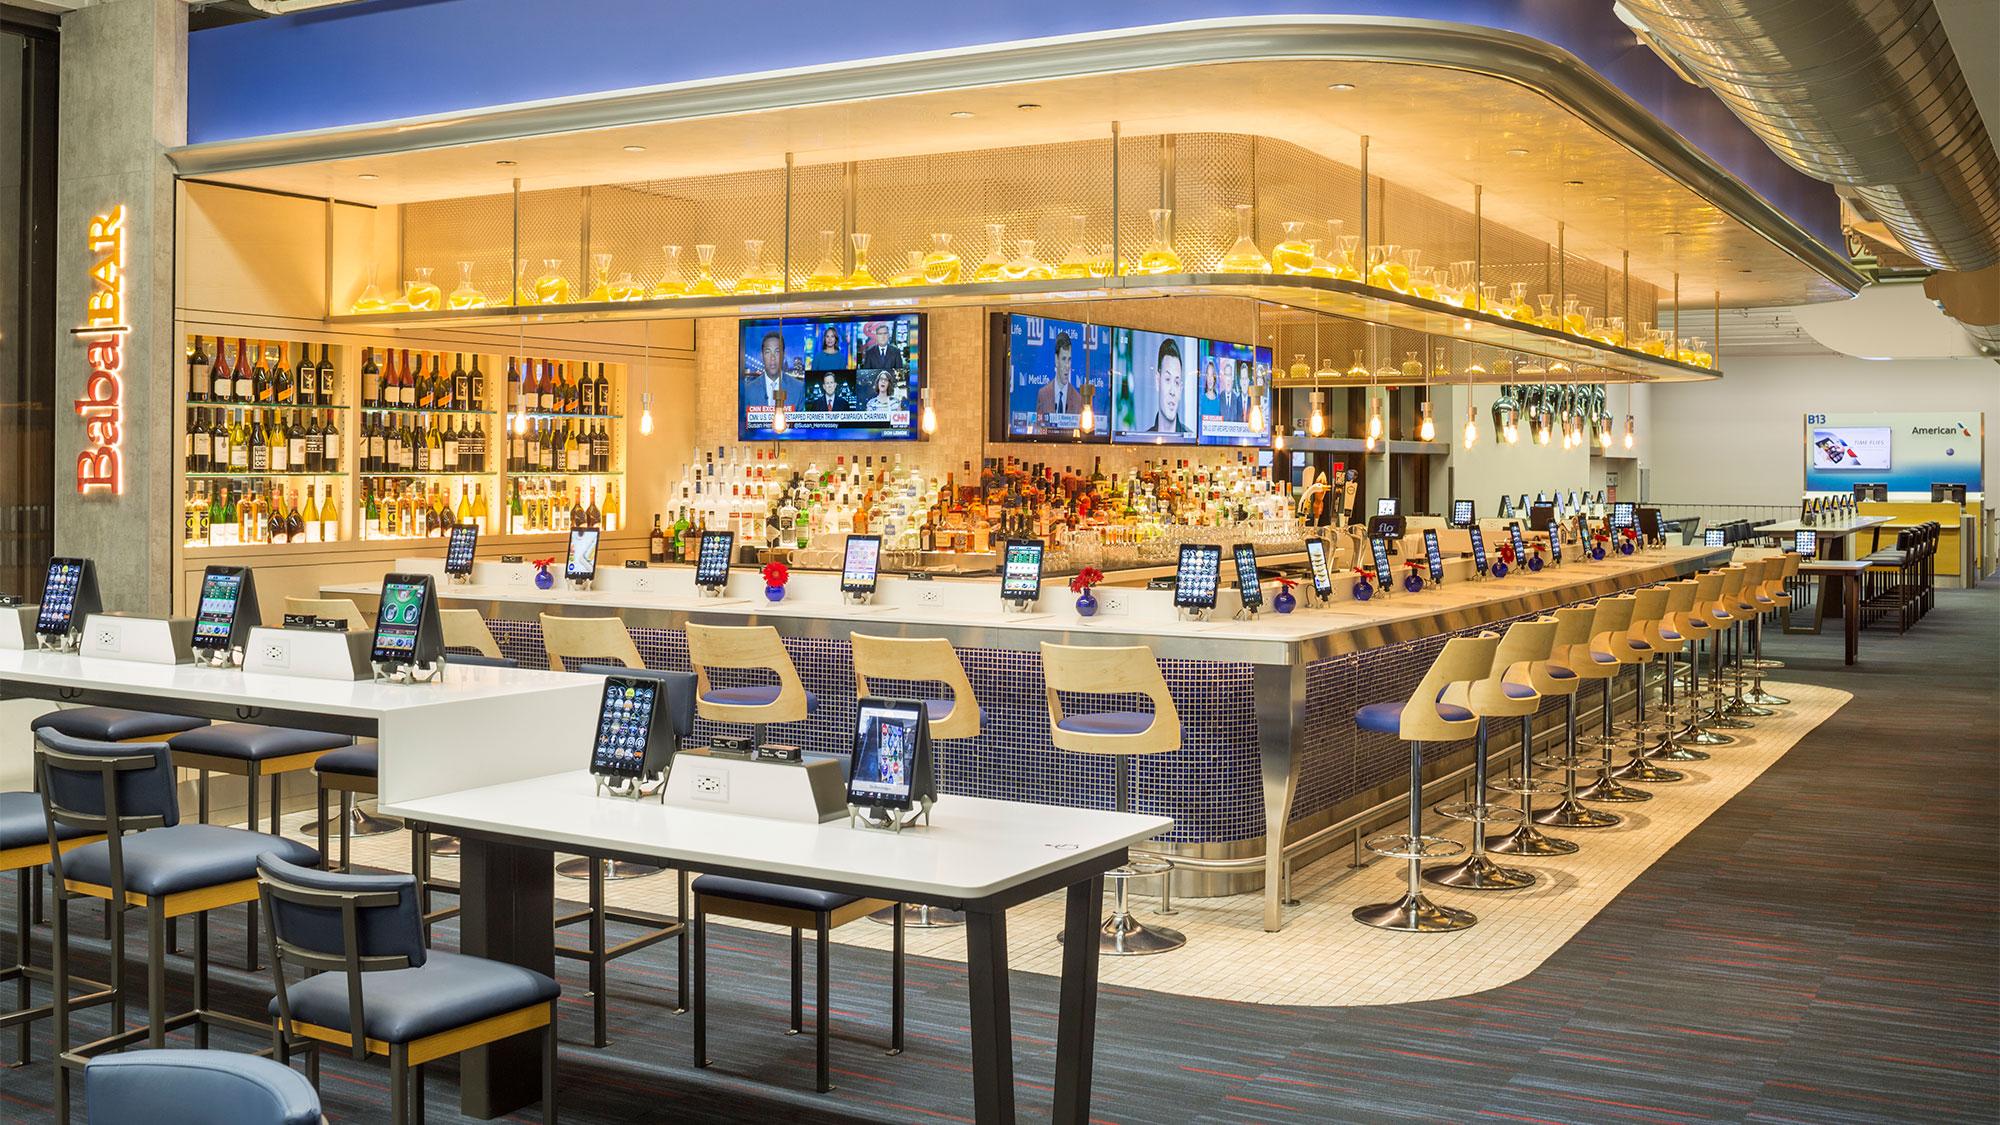 Philadelphia Airport S Terminal B Gets Otg Ipad Restaurants Travel Weekly